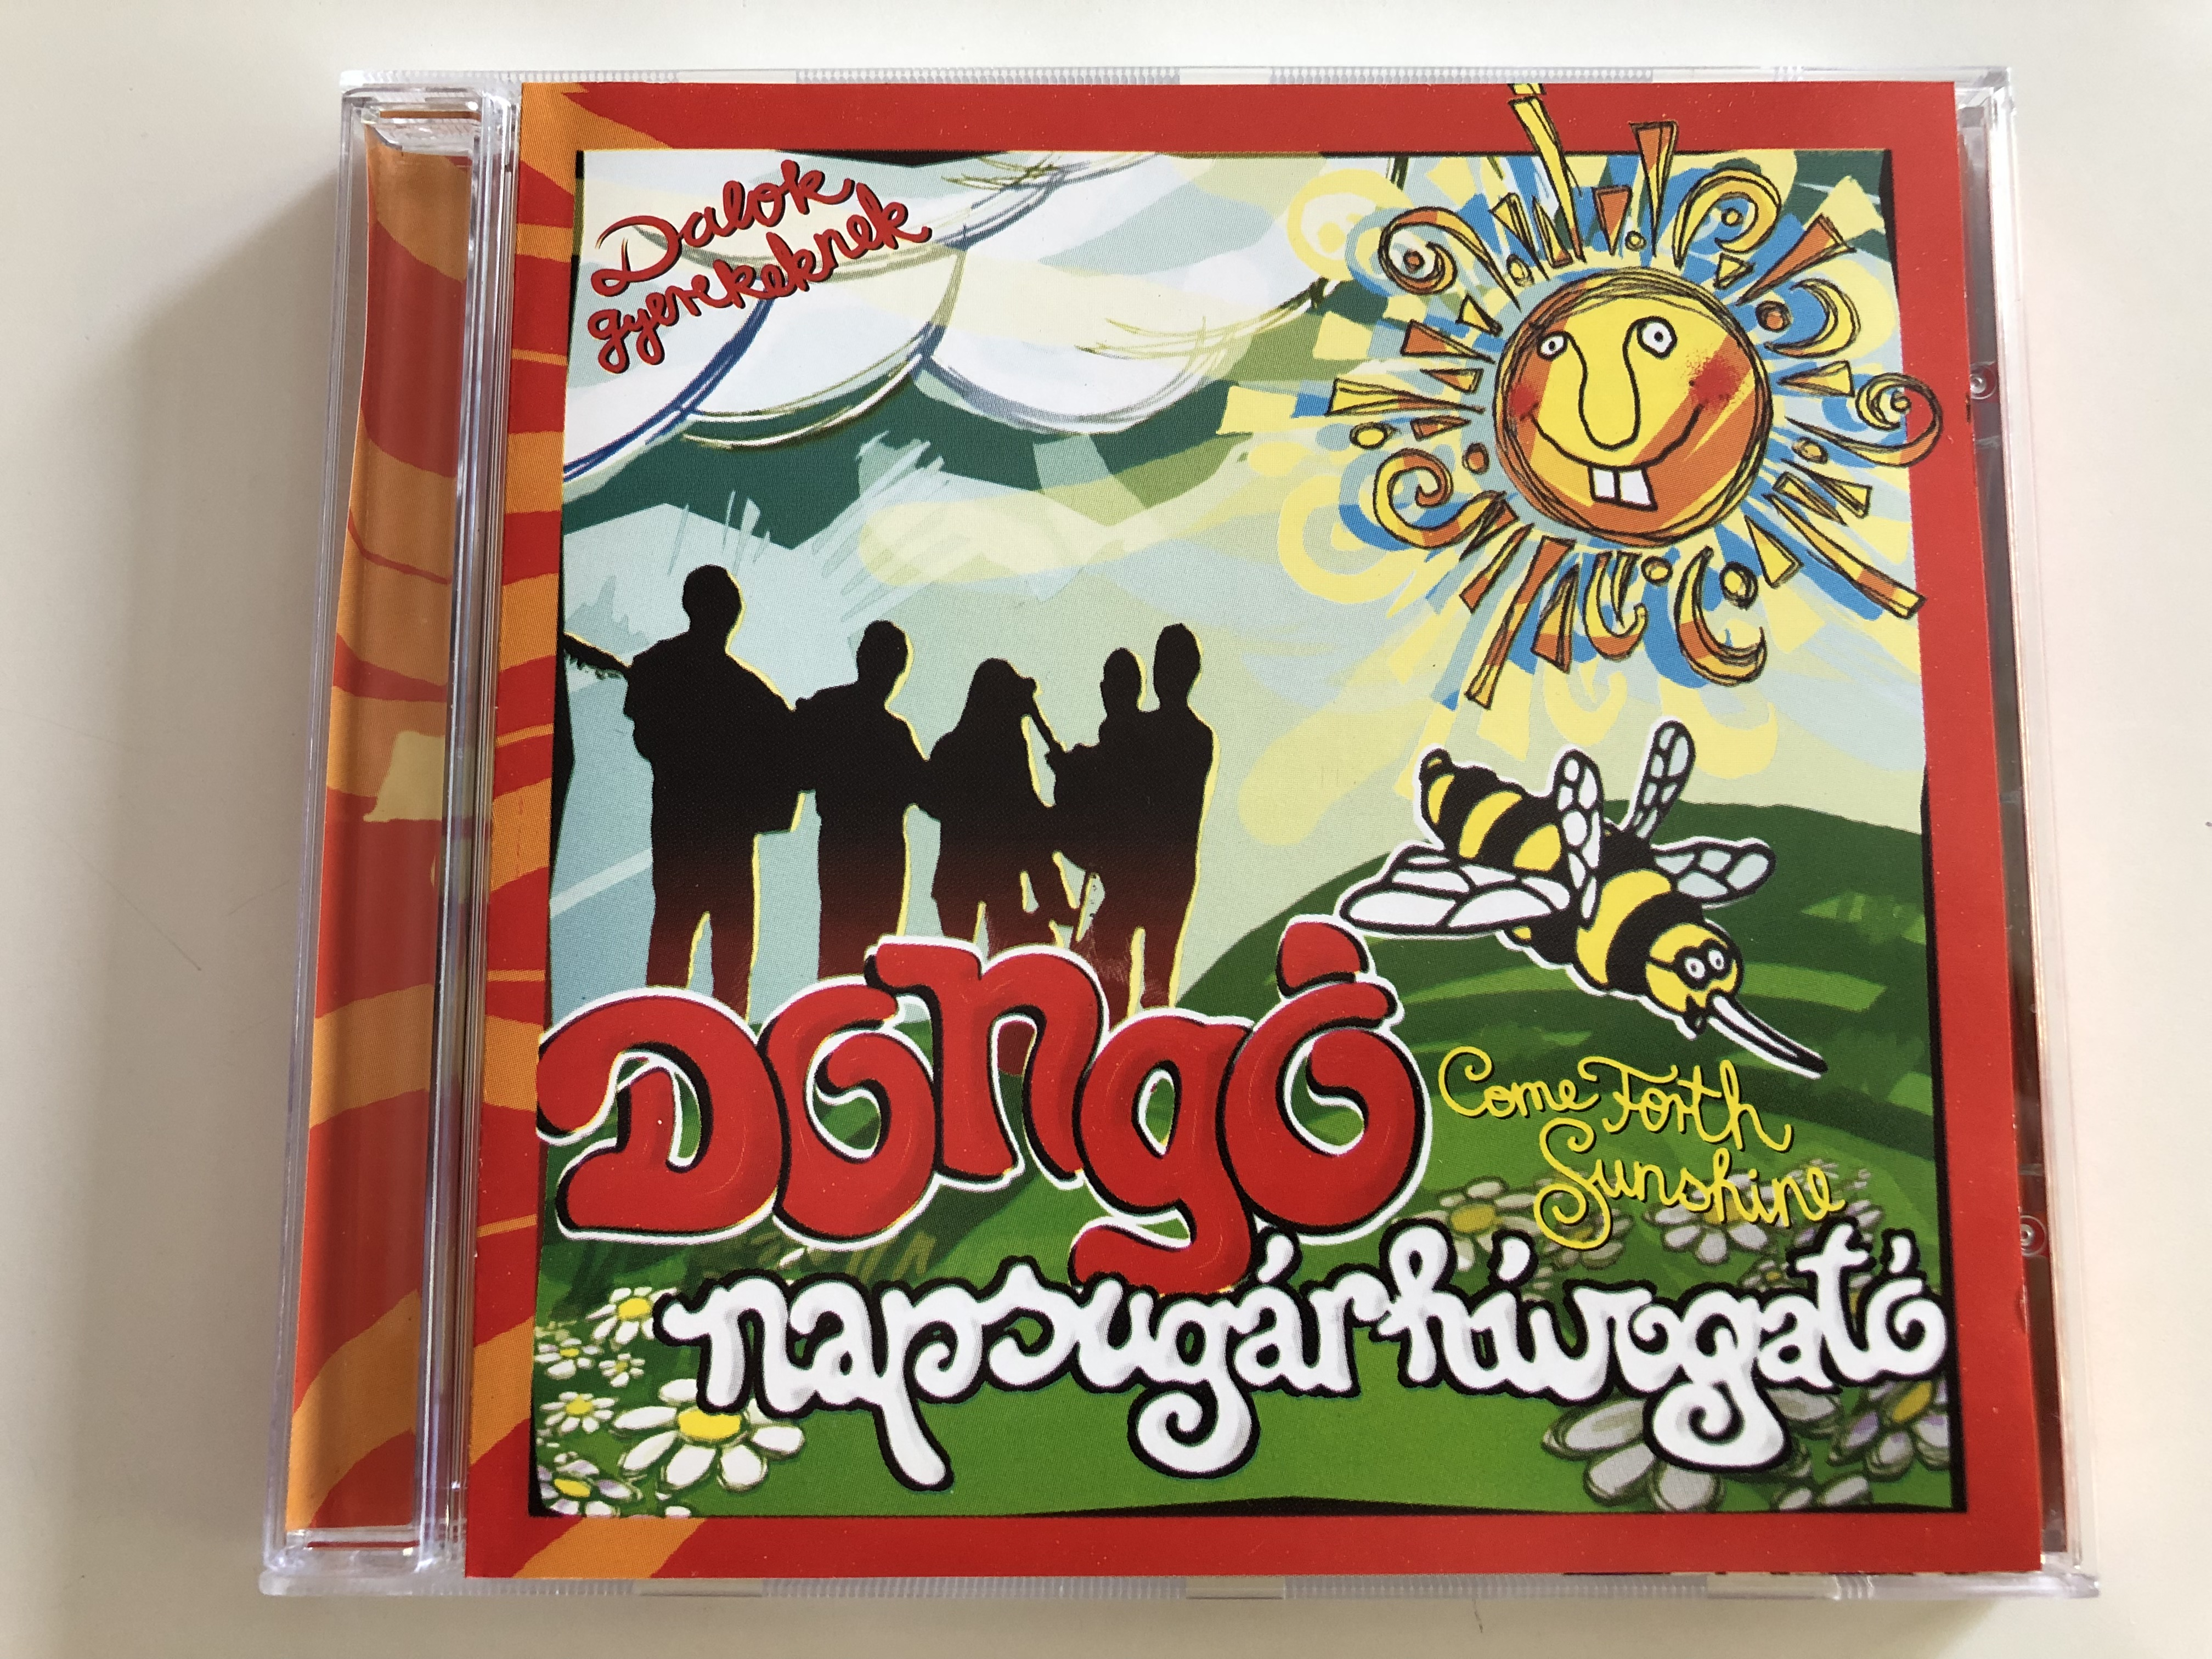 dong-dalok-gyerekeknek-napsug-r-h-vogat-come-forth-sunshine-hungarian-children-s-songs-audio-cd-2001-bgcd-093-1-.jpg